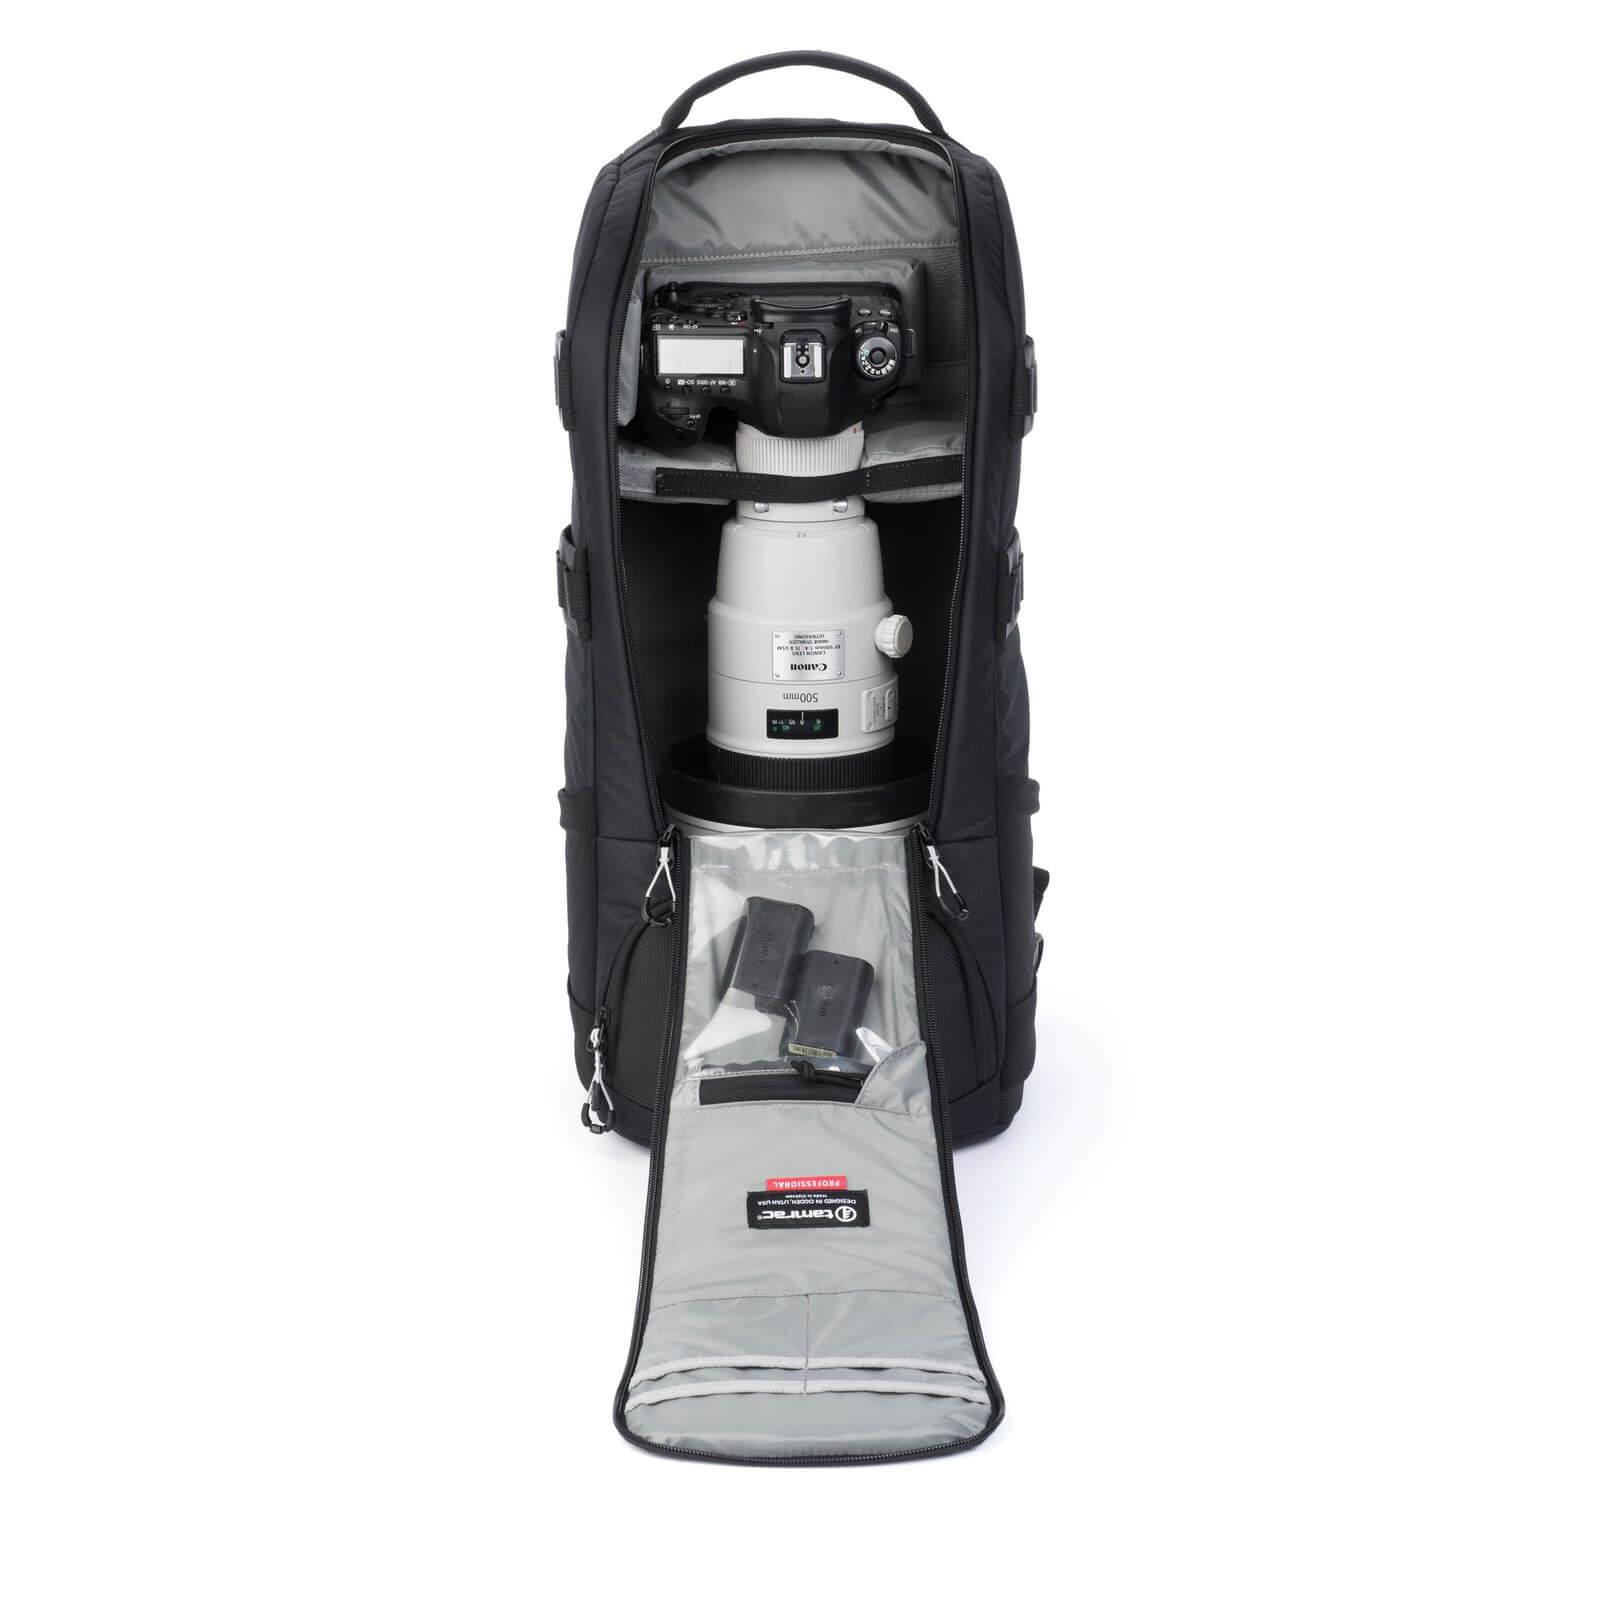 Best DSLR Camera Bags - Tamrac Anvil Super 25 Camera Backpack